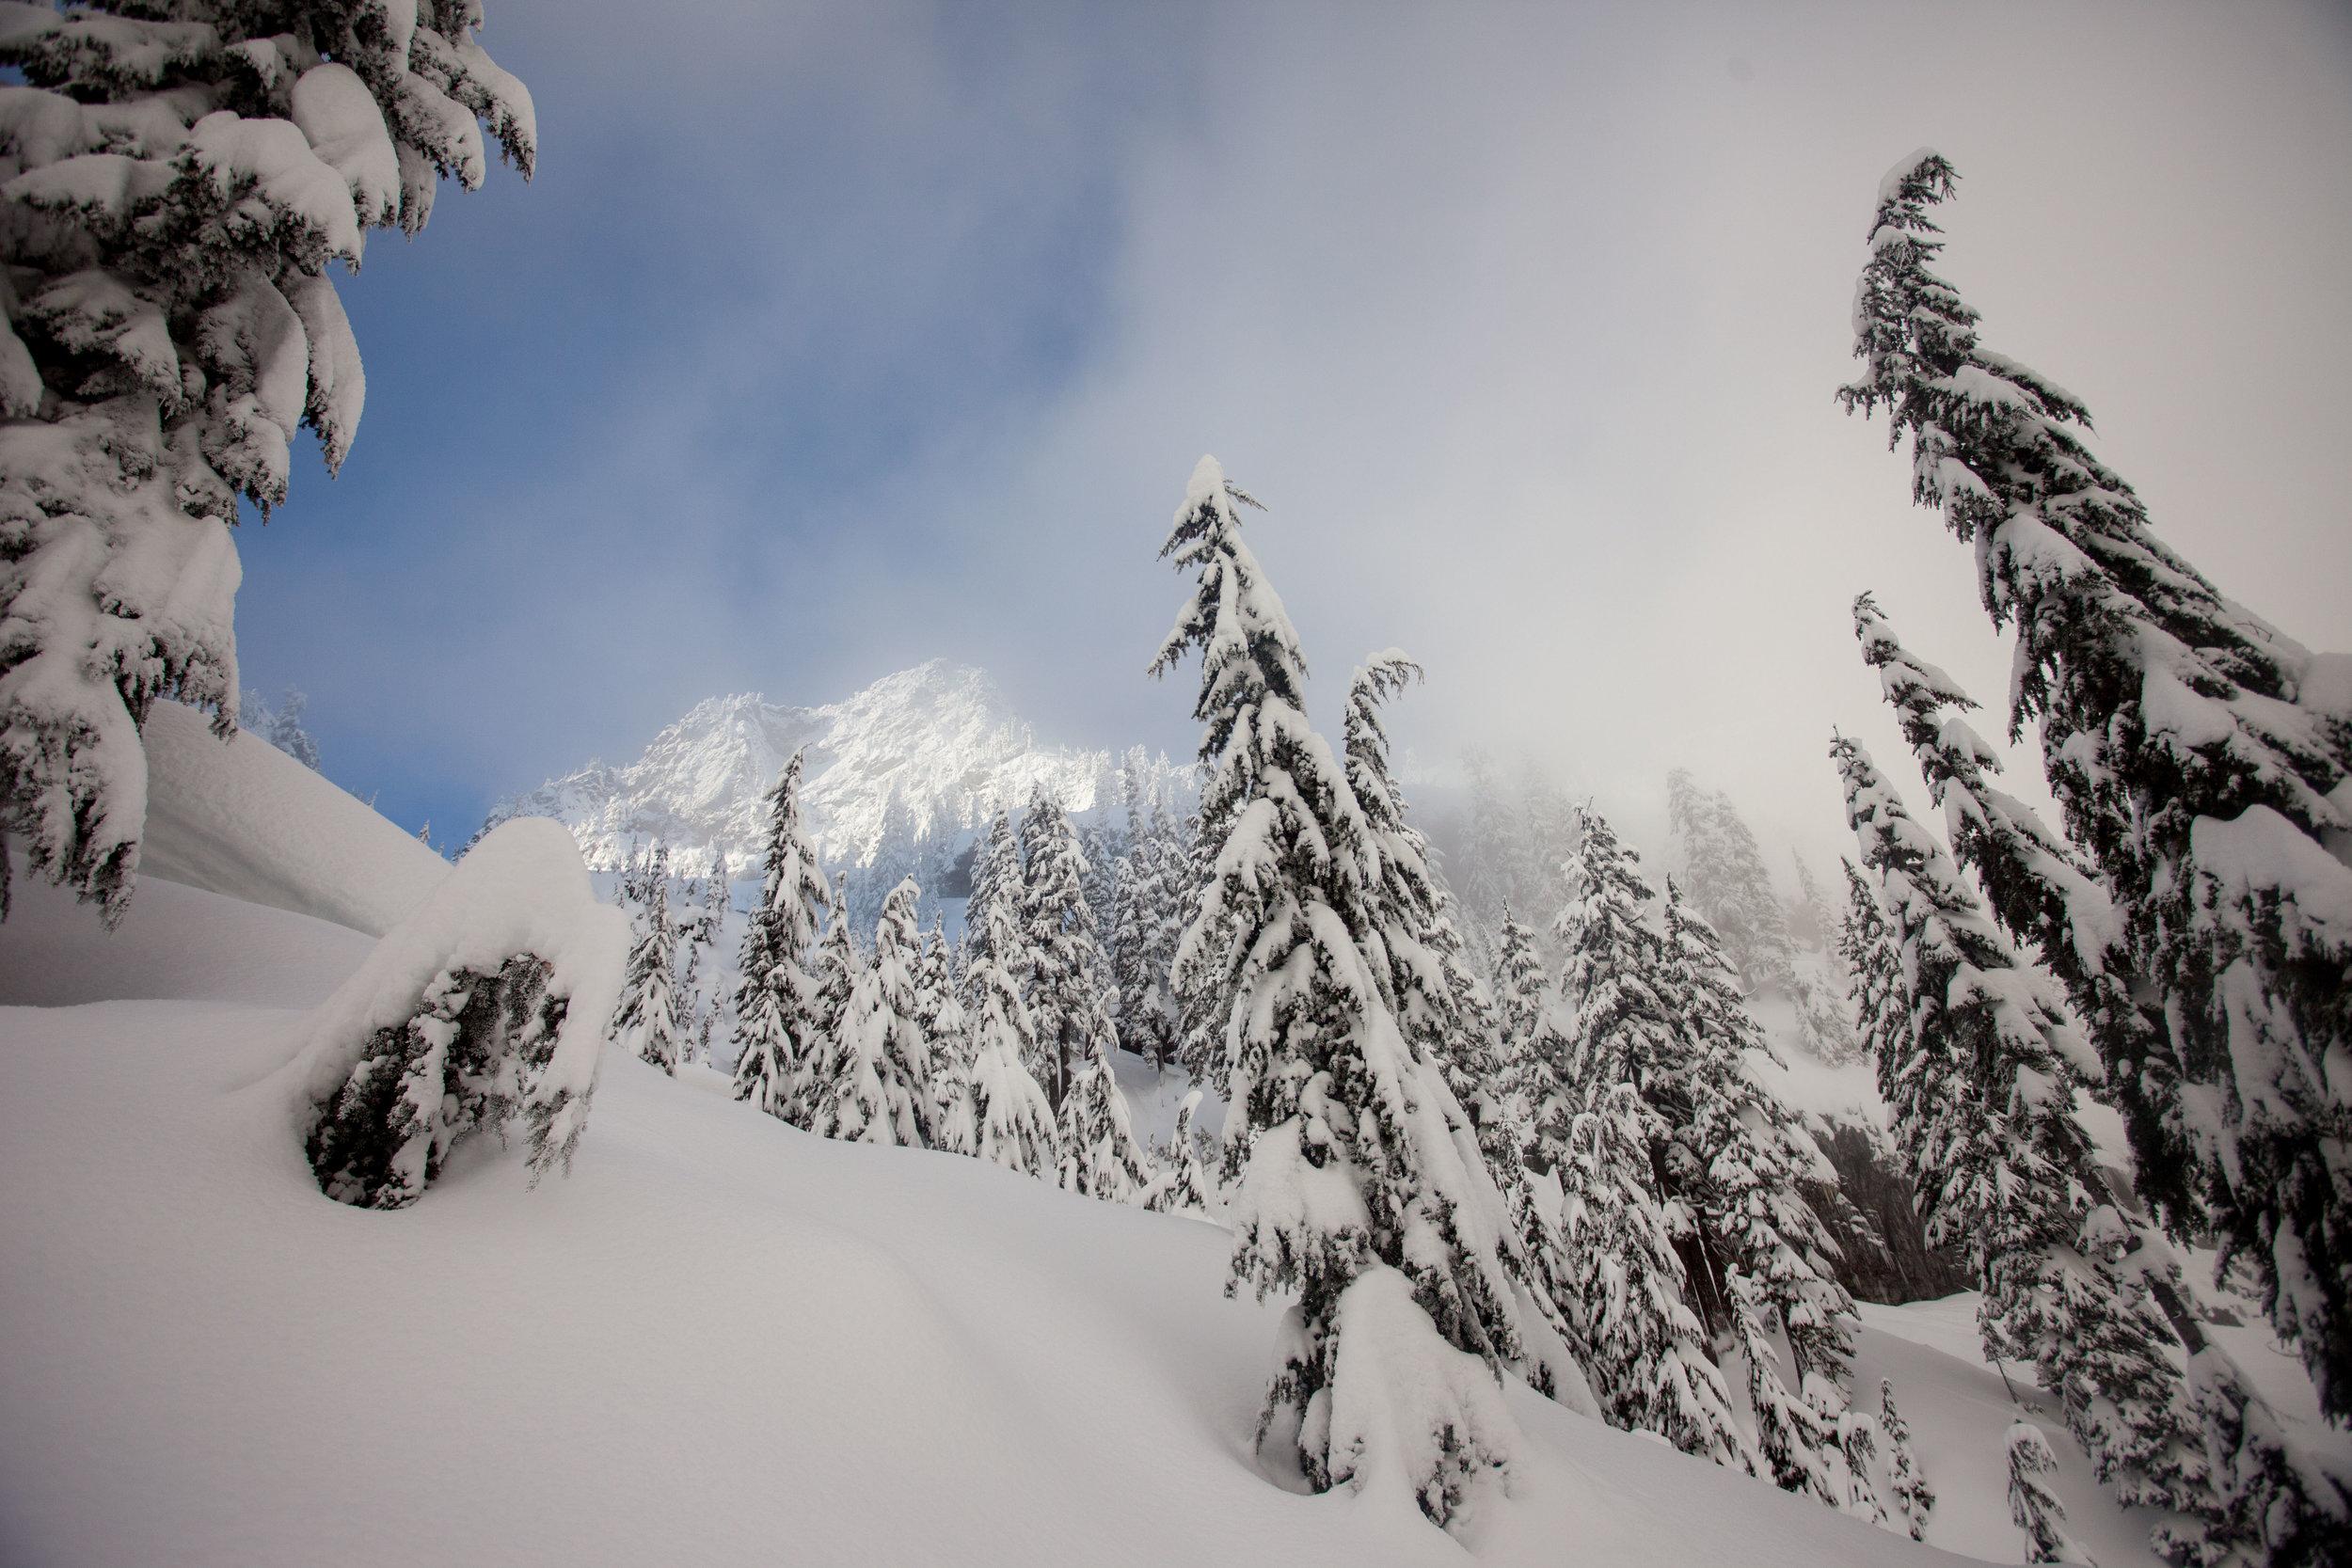 Bryant Peak shines through the clouds